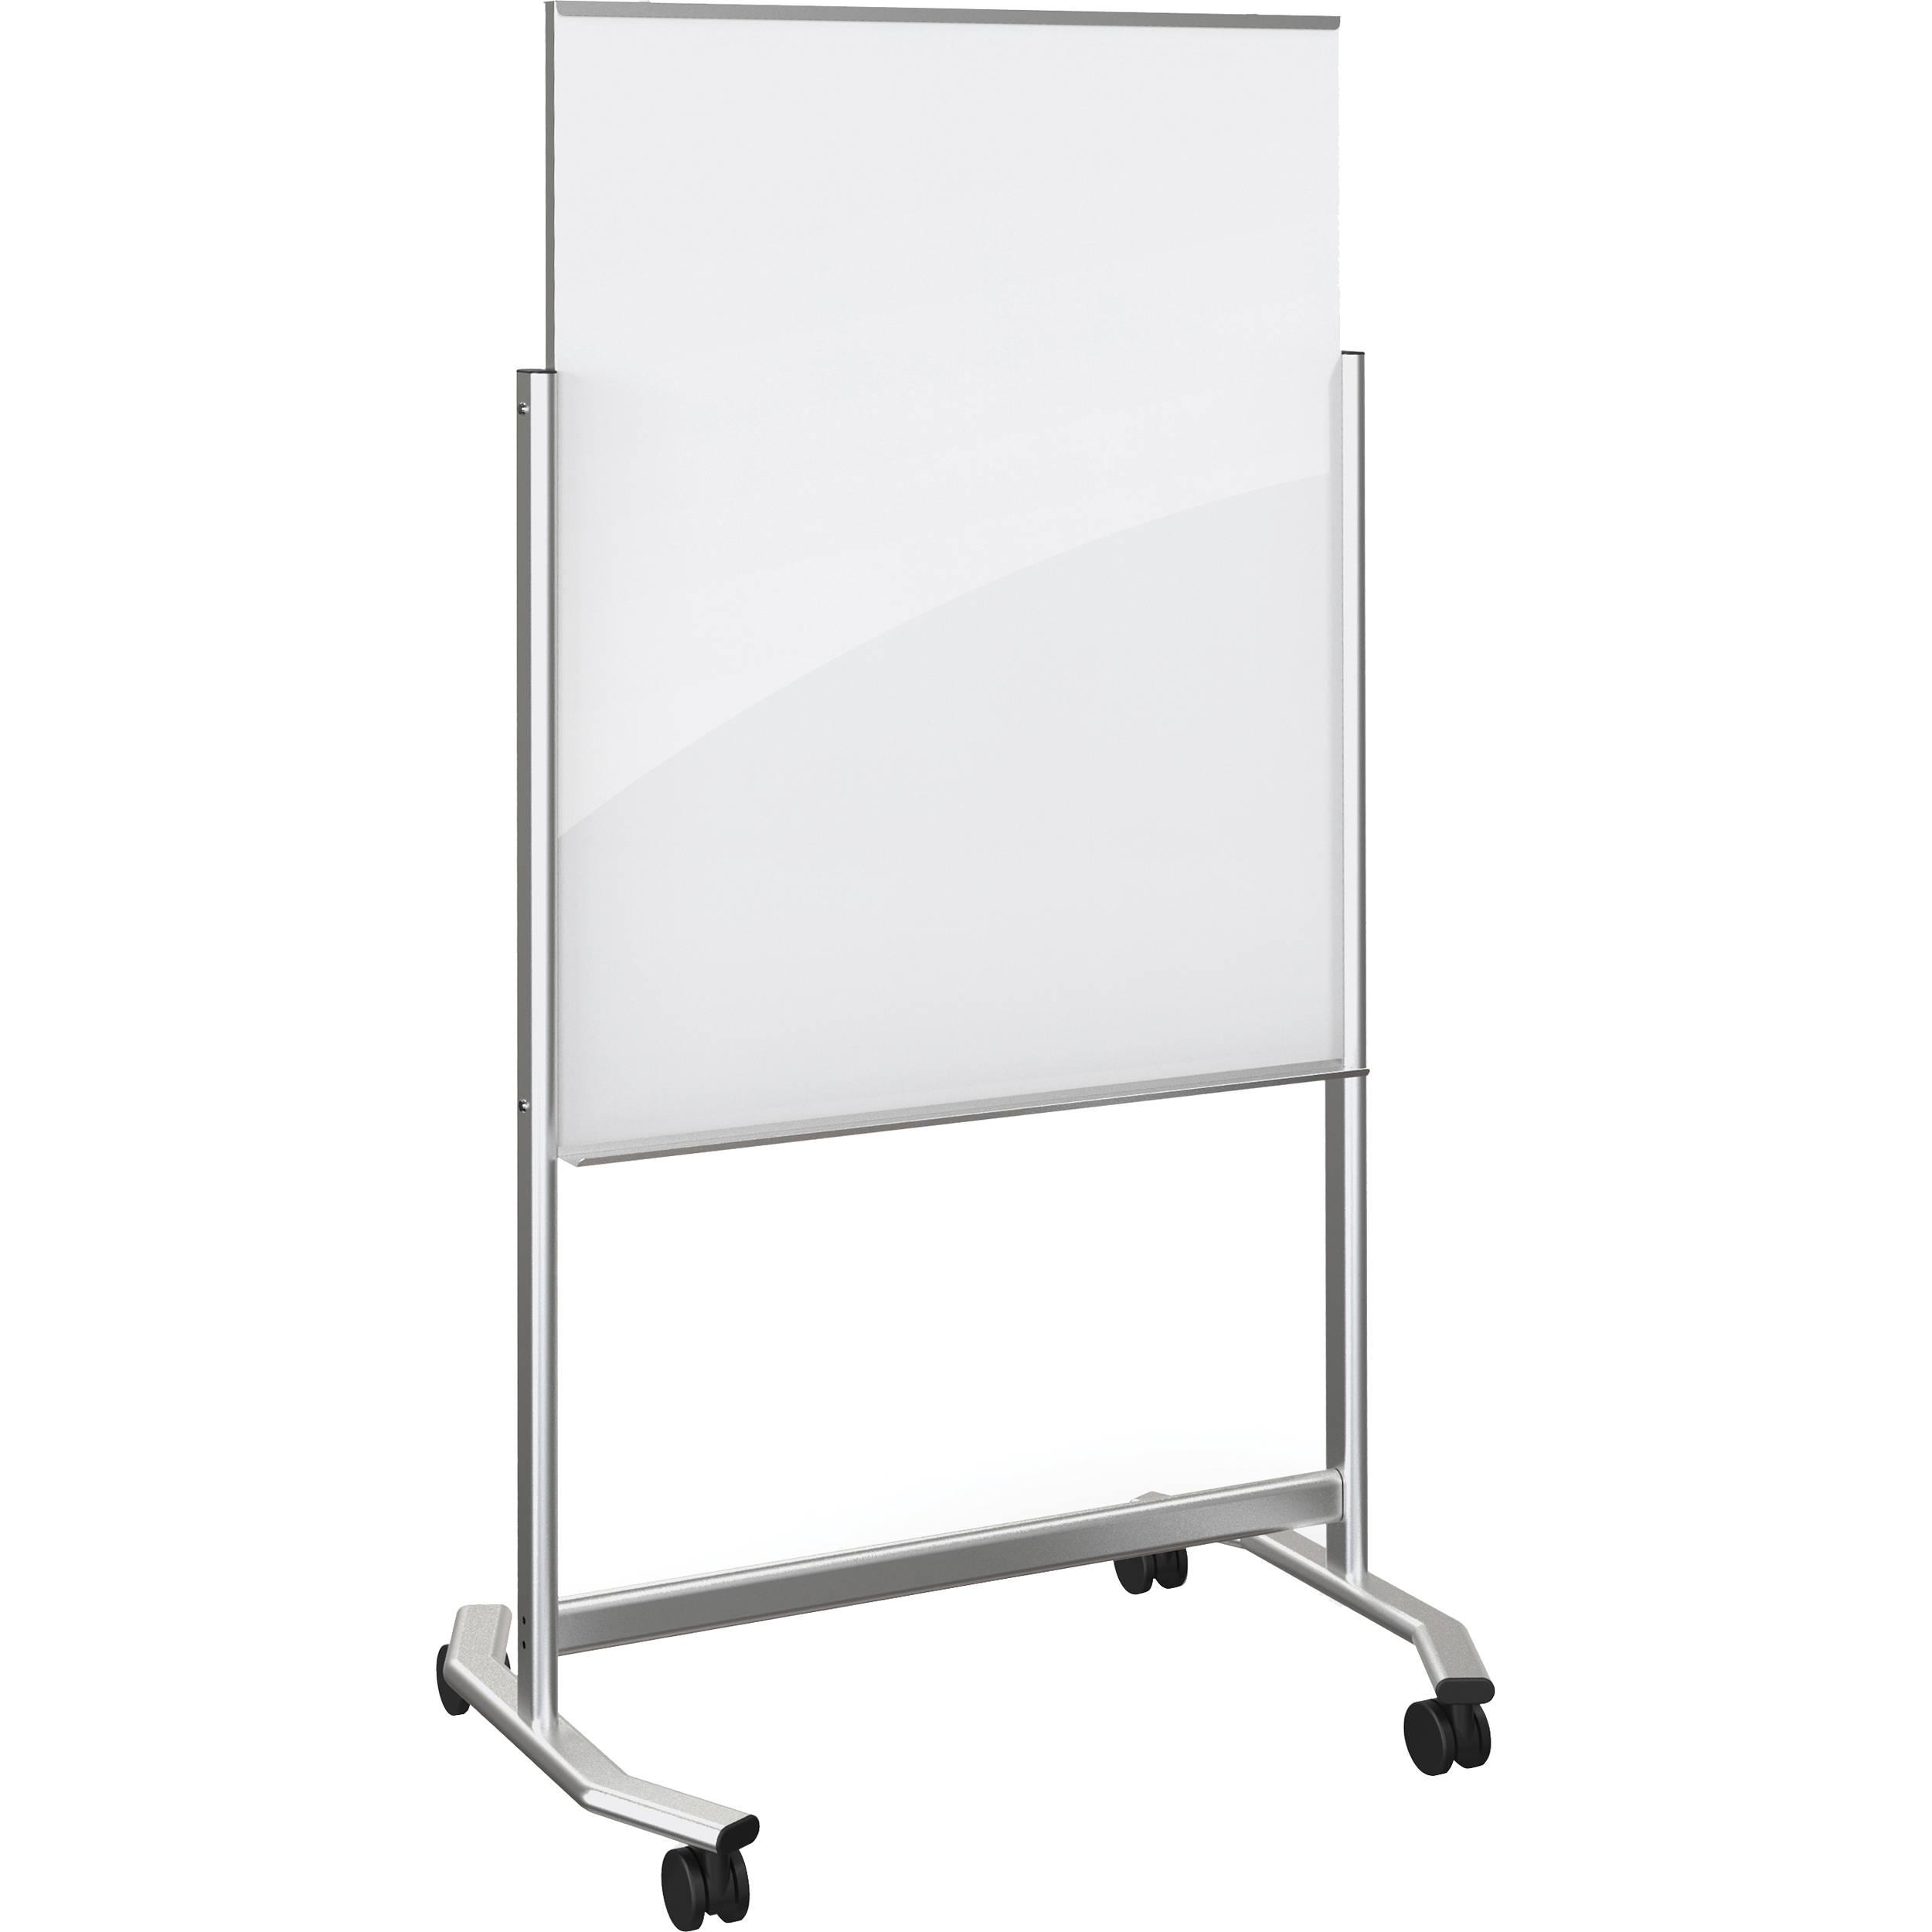 balt visionary move mobile magnetic glass whiteboard 74950 b h. Black Bedroom Furniture Sets. Home Design Ideas